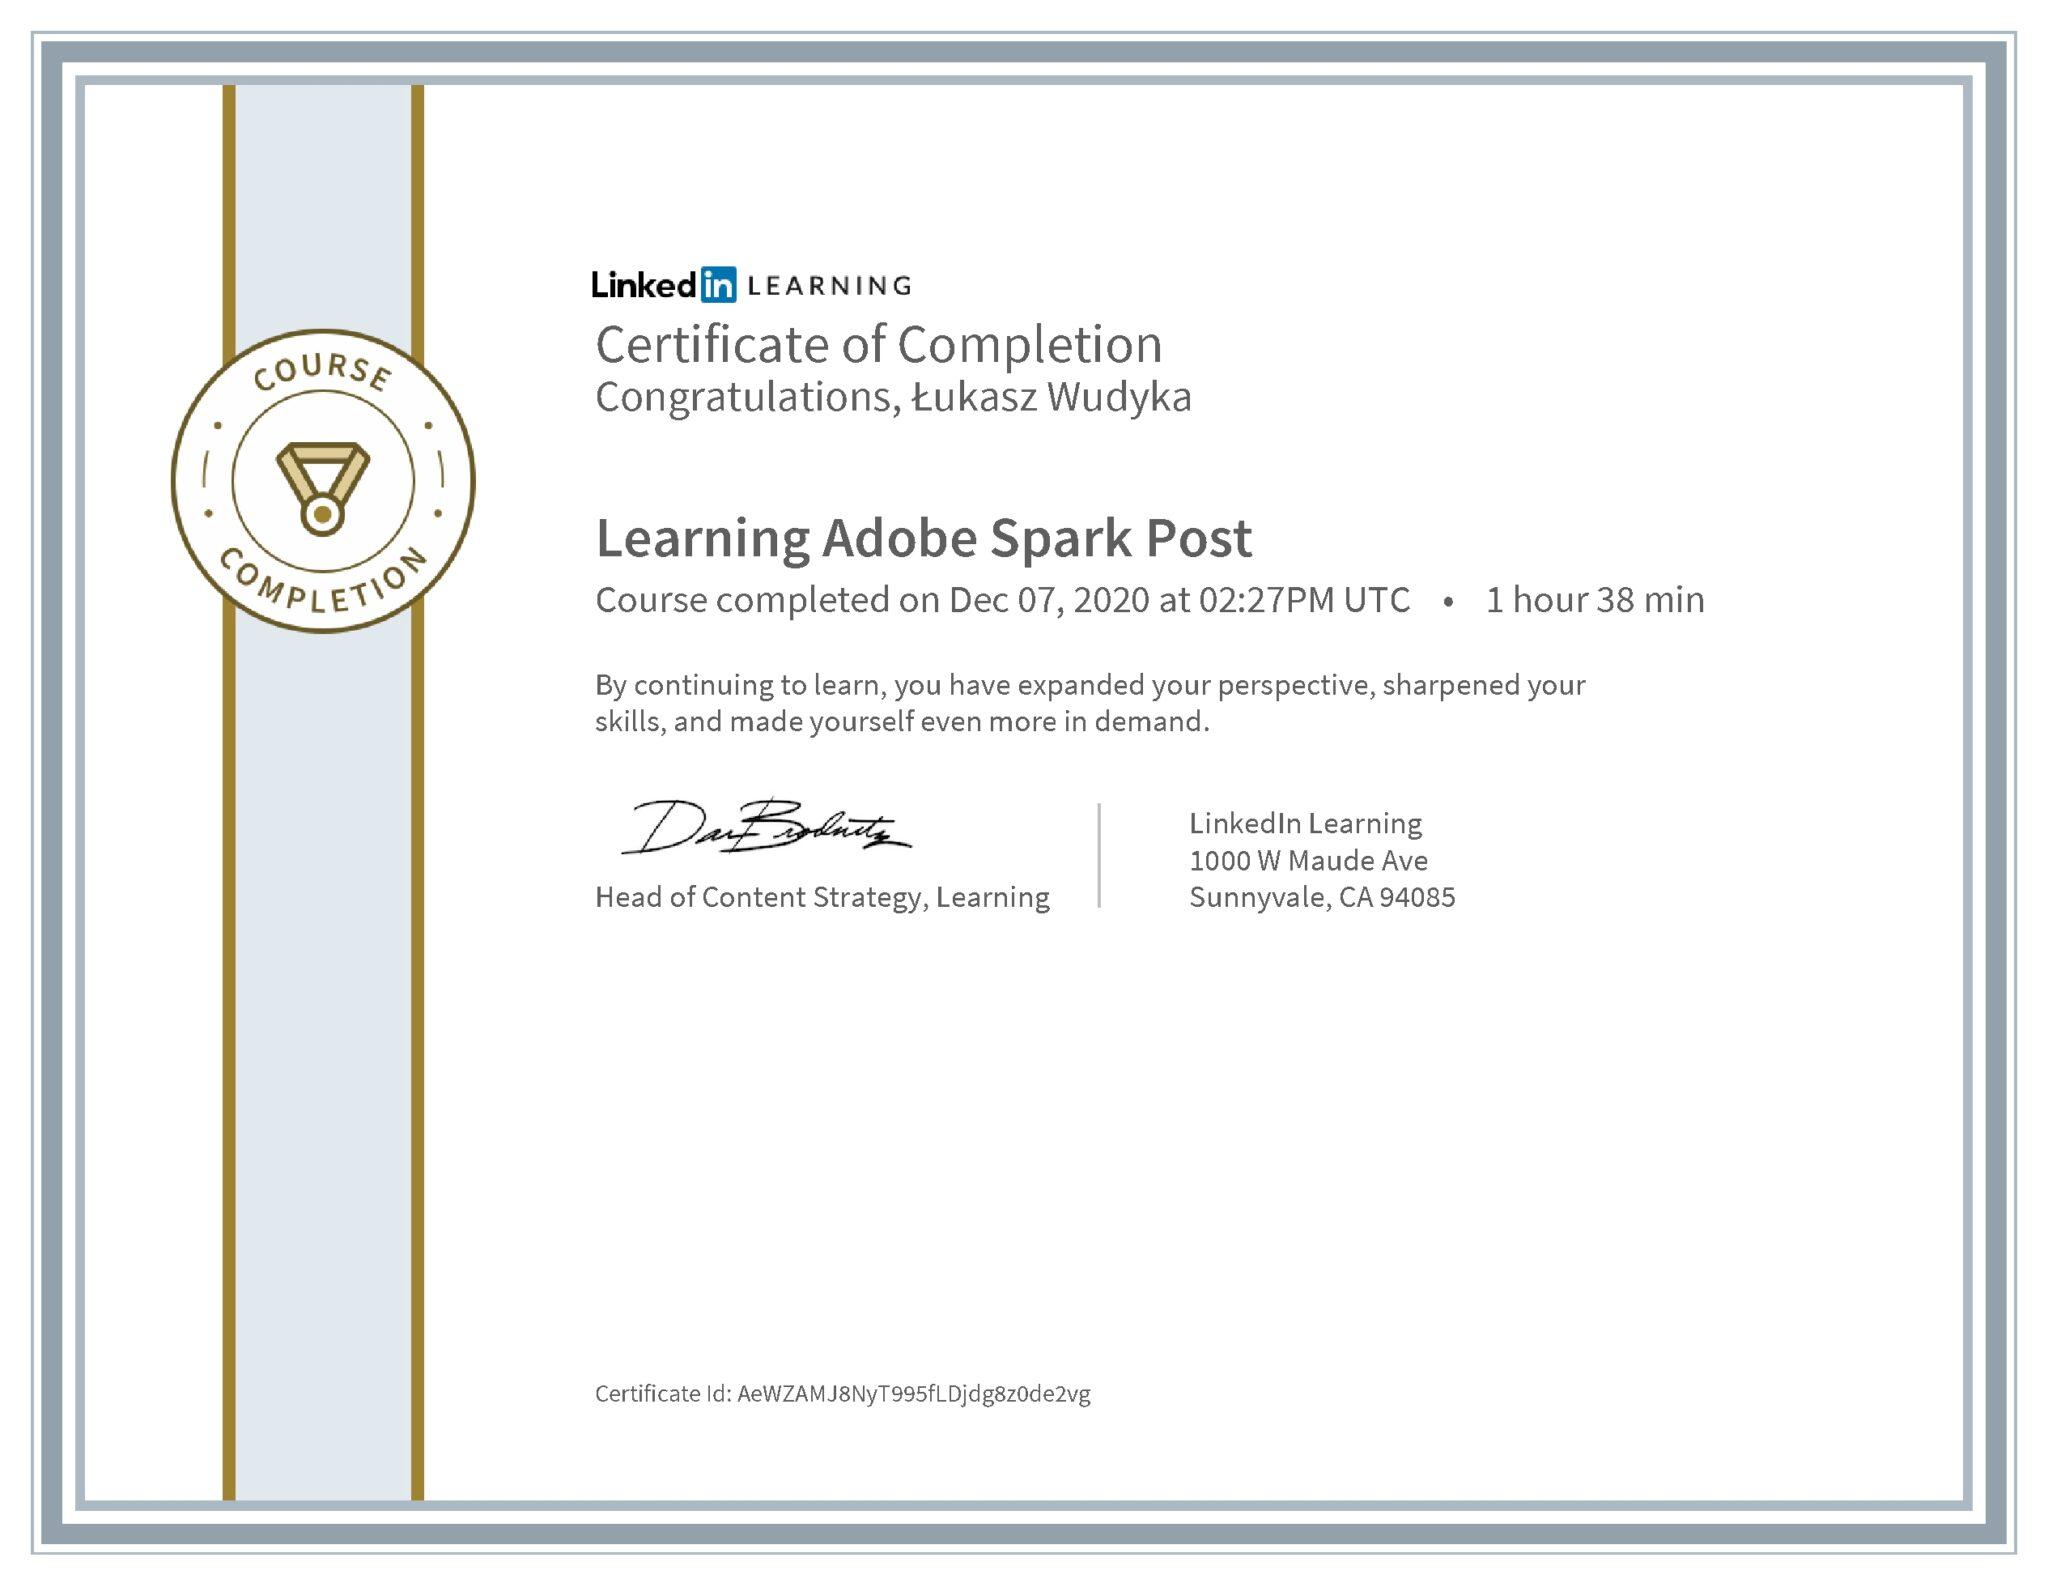 Łukasz Wudyka certyfikat LinkedIn Learning Adobe Spark Post